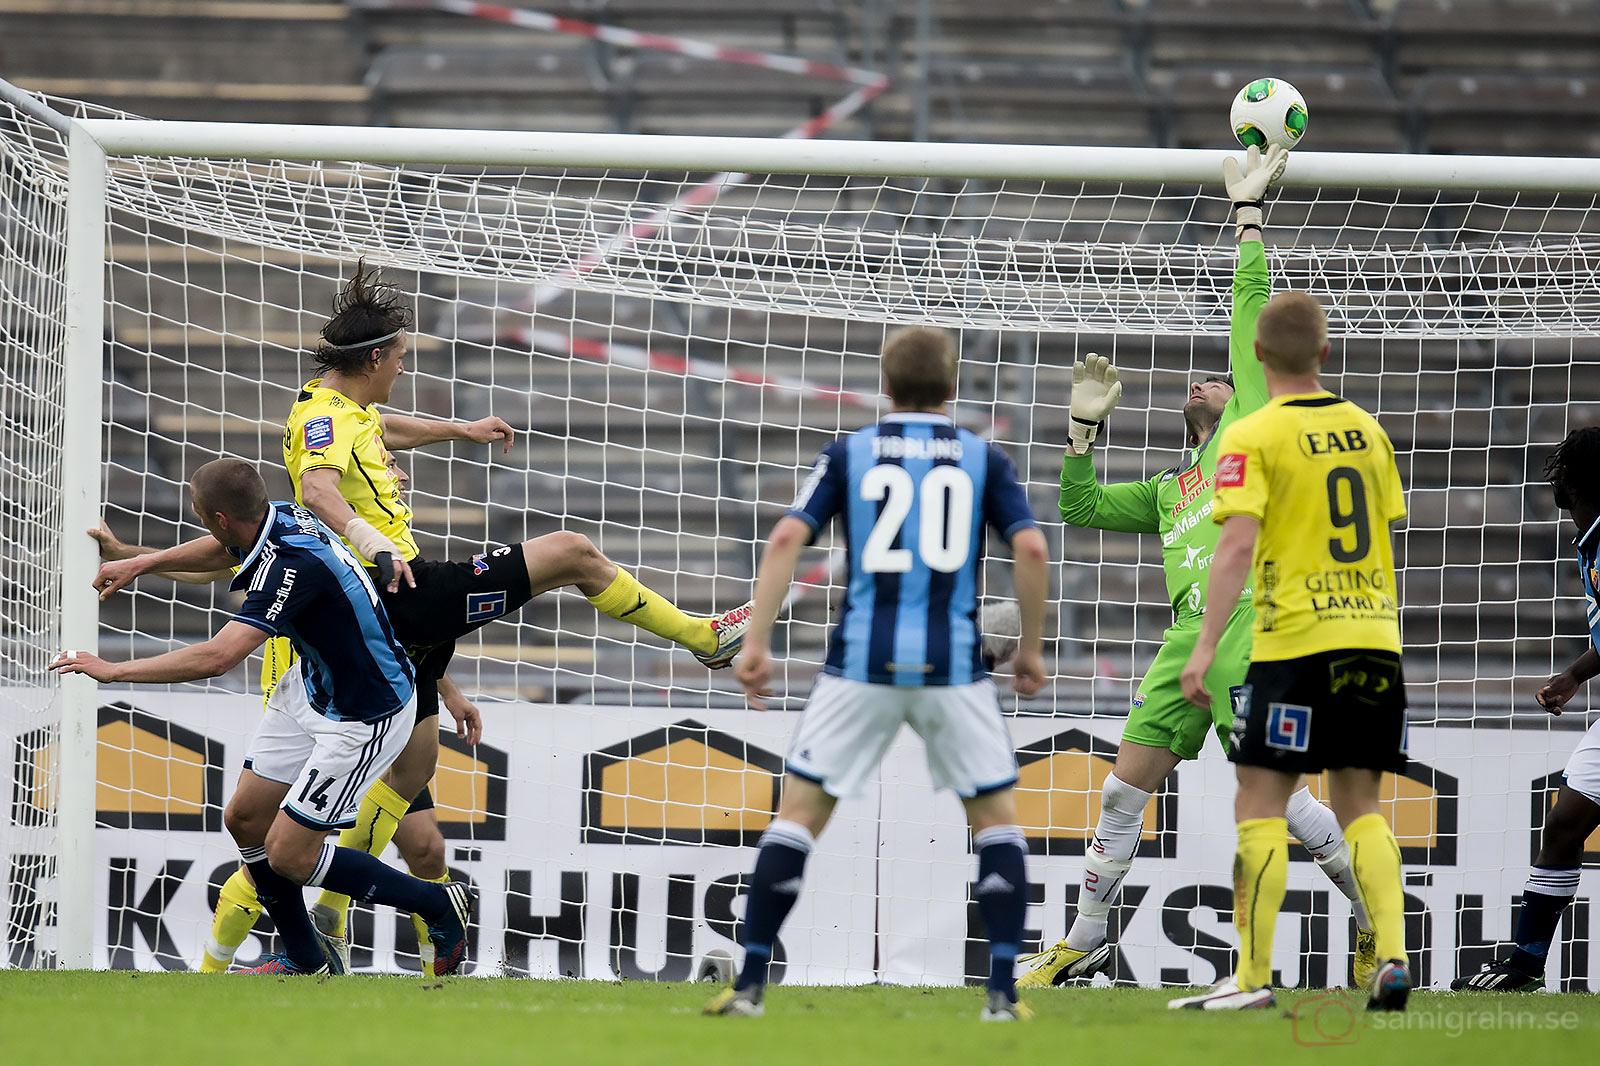 Halmstad målvakt Stojan Lukic tippar ut bollen